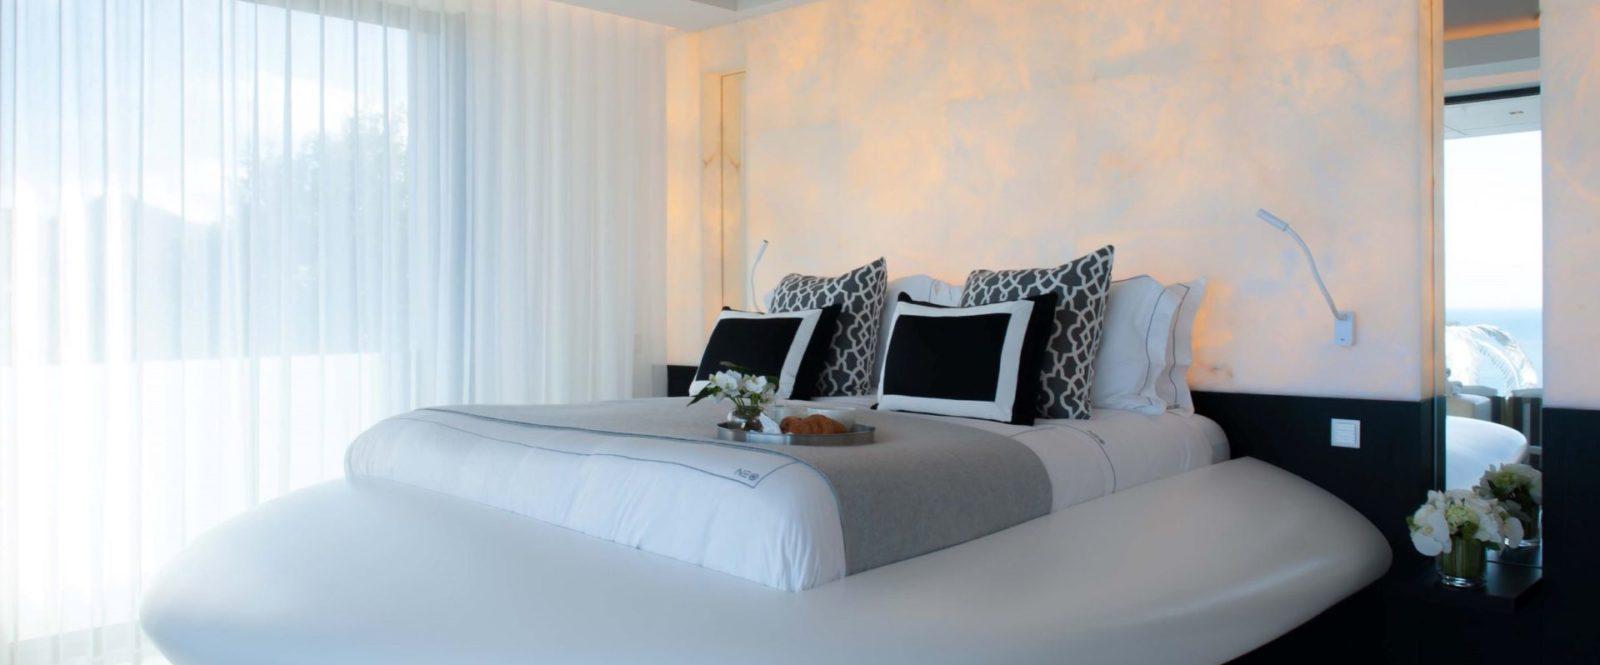 NEO - guest-suite-3